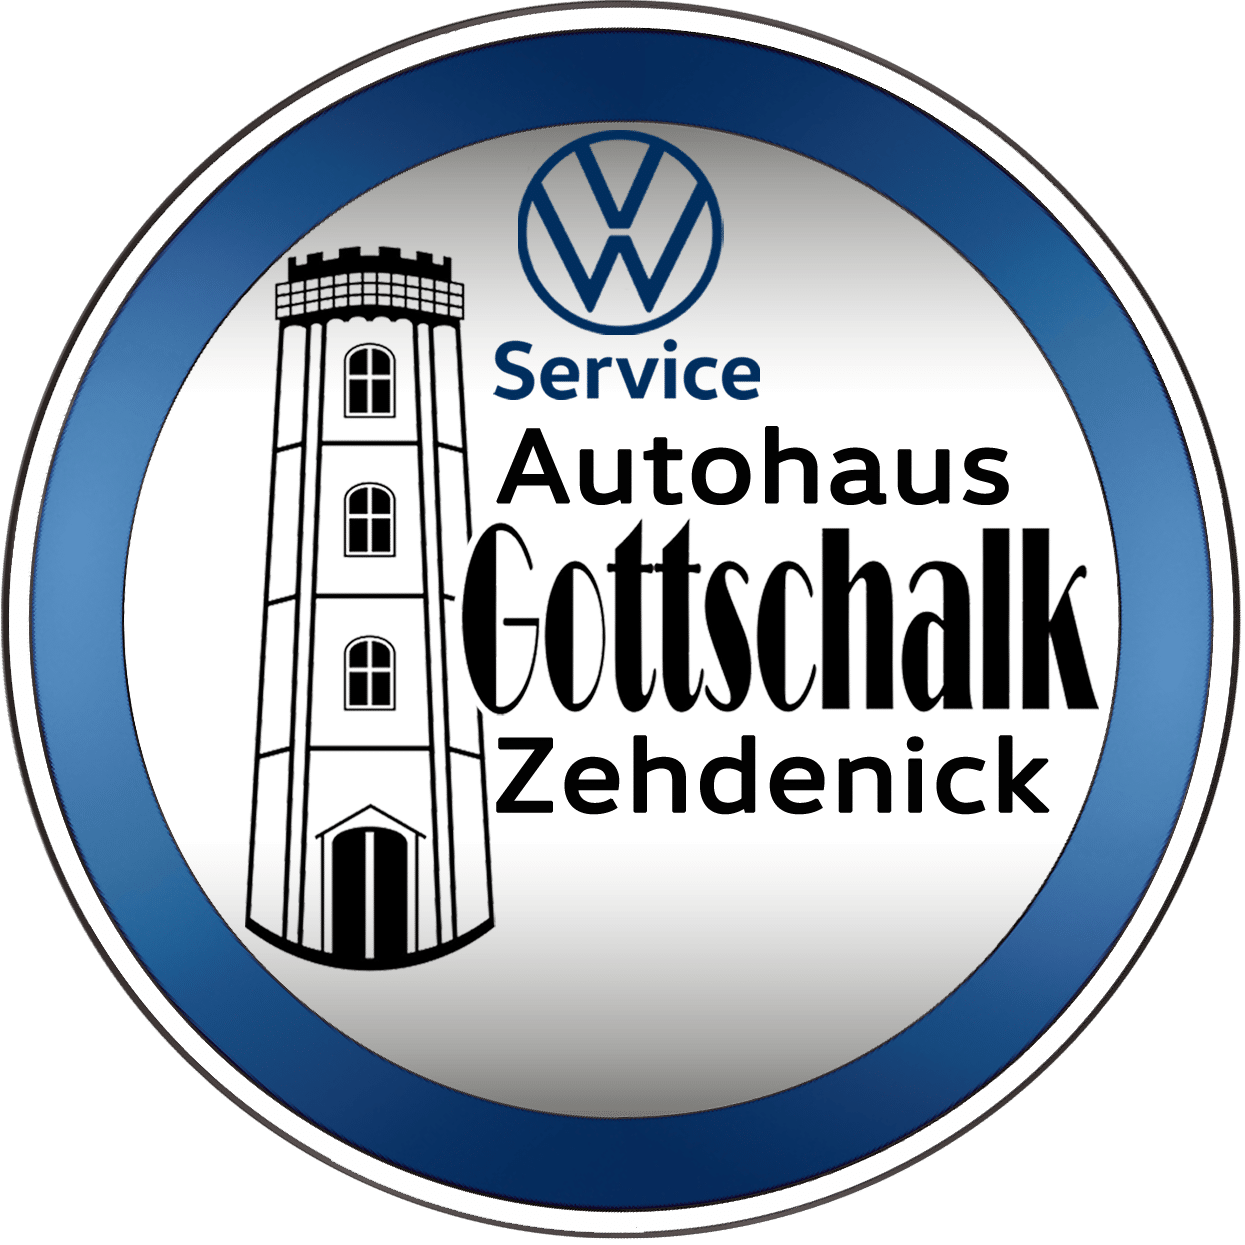 Autohaus VW-Gottchalk